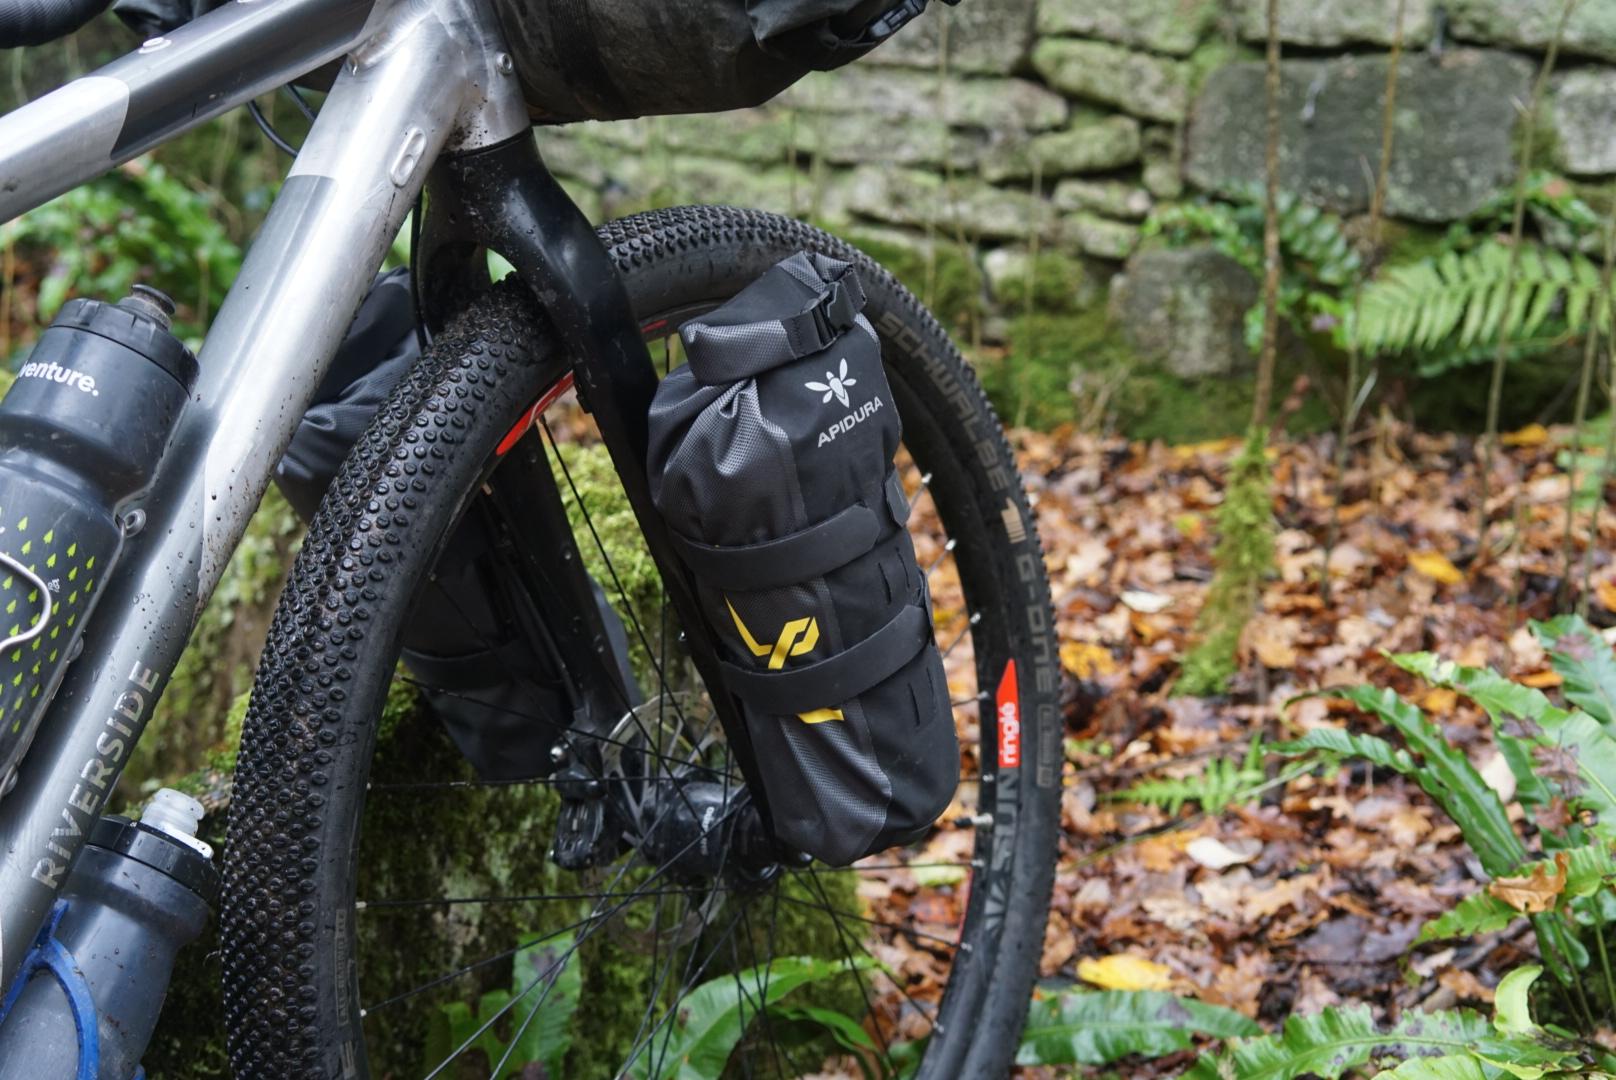 Apidura fork packs Riverside 920 Touring Trekking Bikepacking Decathlon Cheap Budget